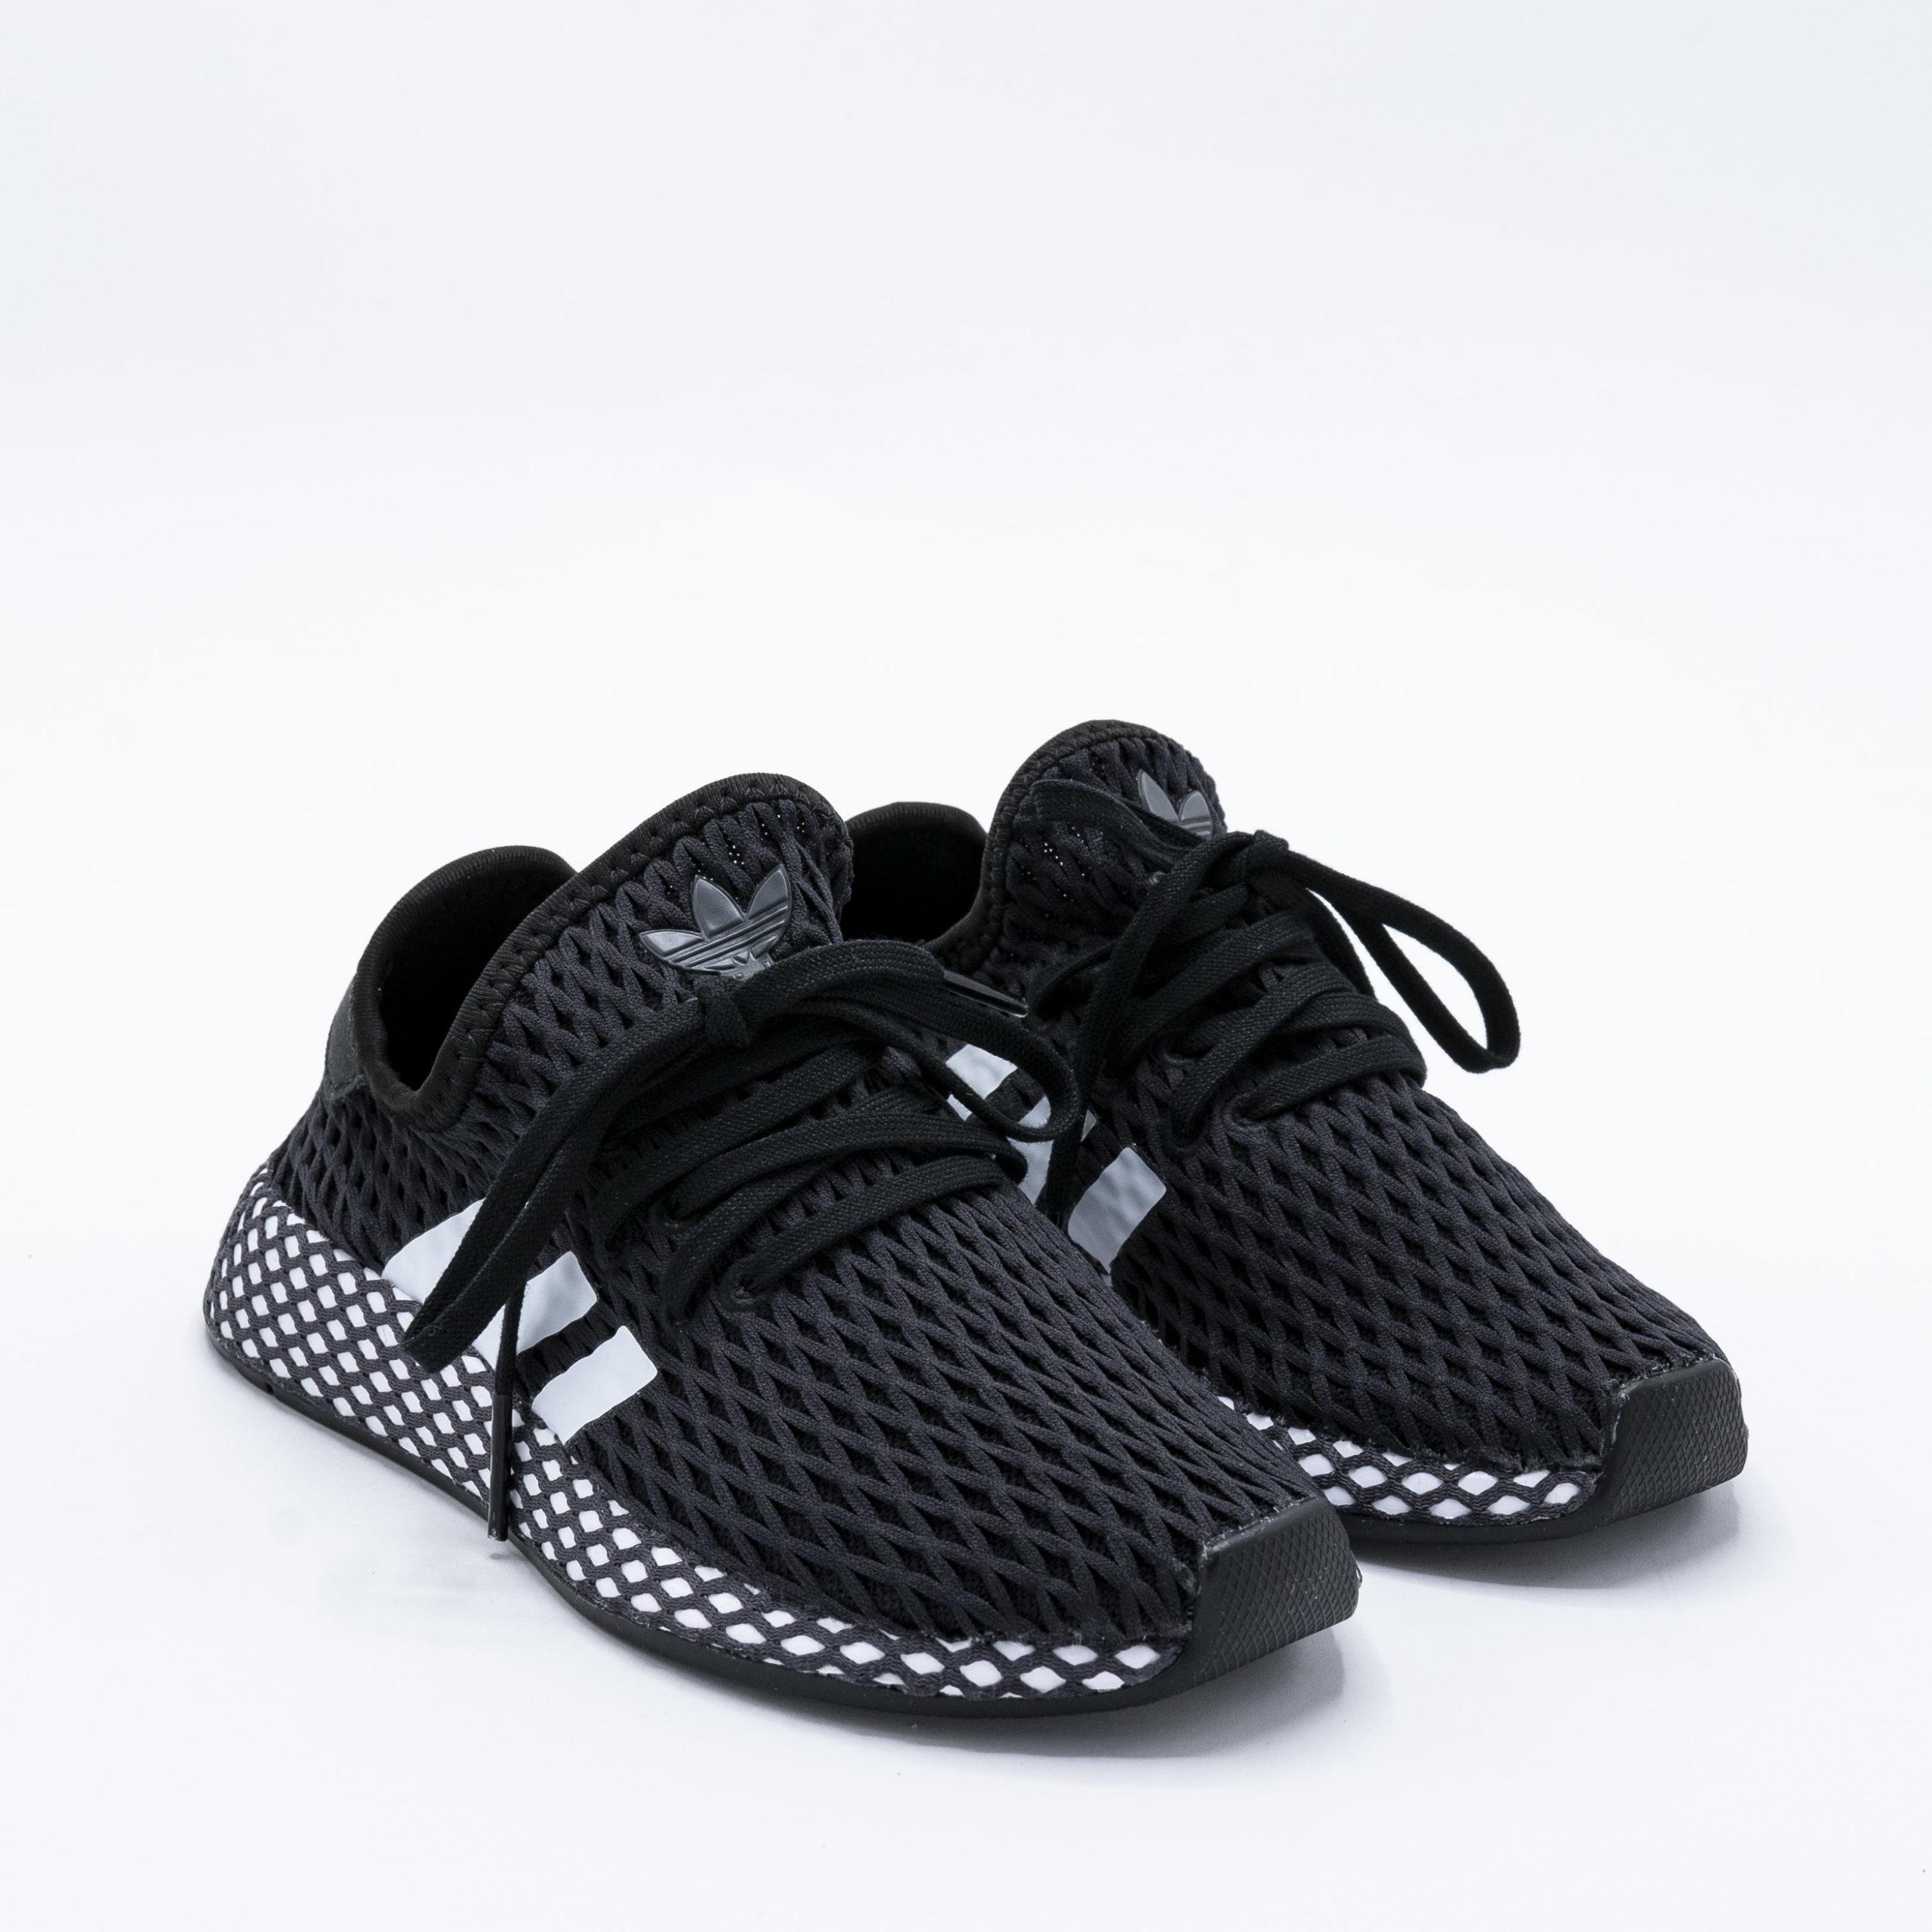 scarpe adidas per bimbi OFF64% pect.se!